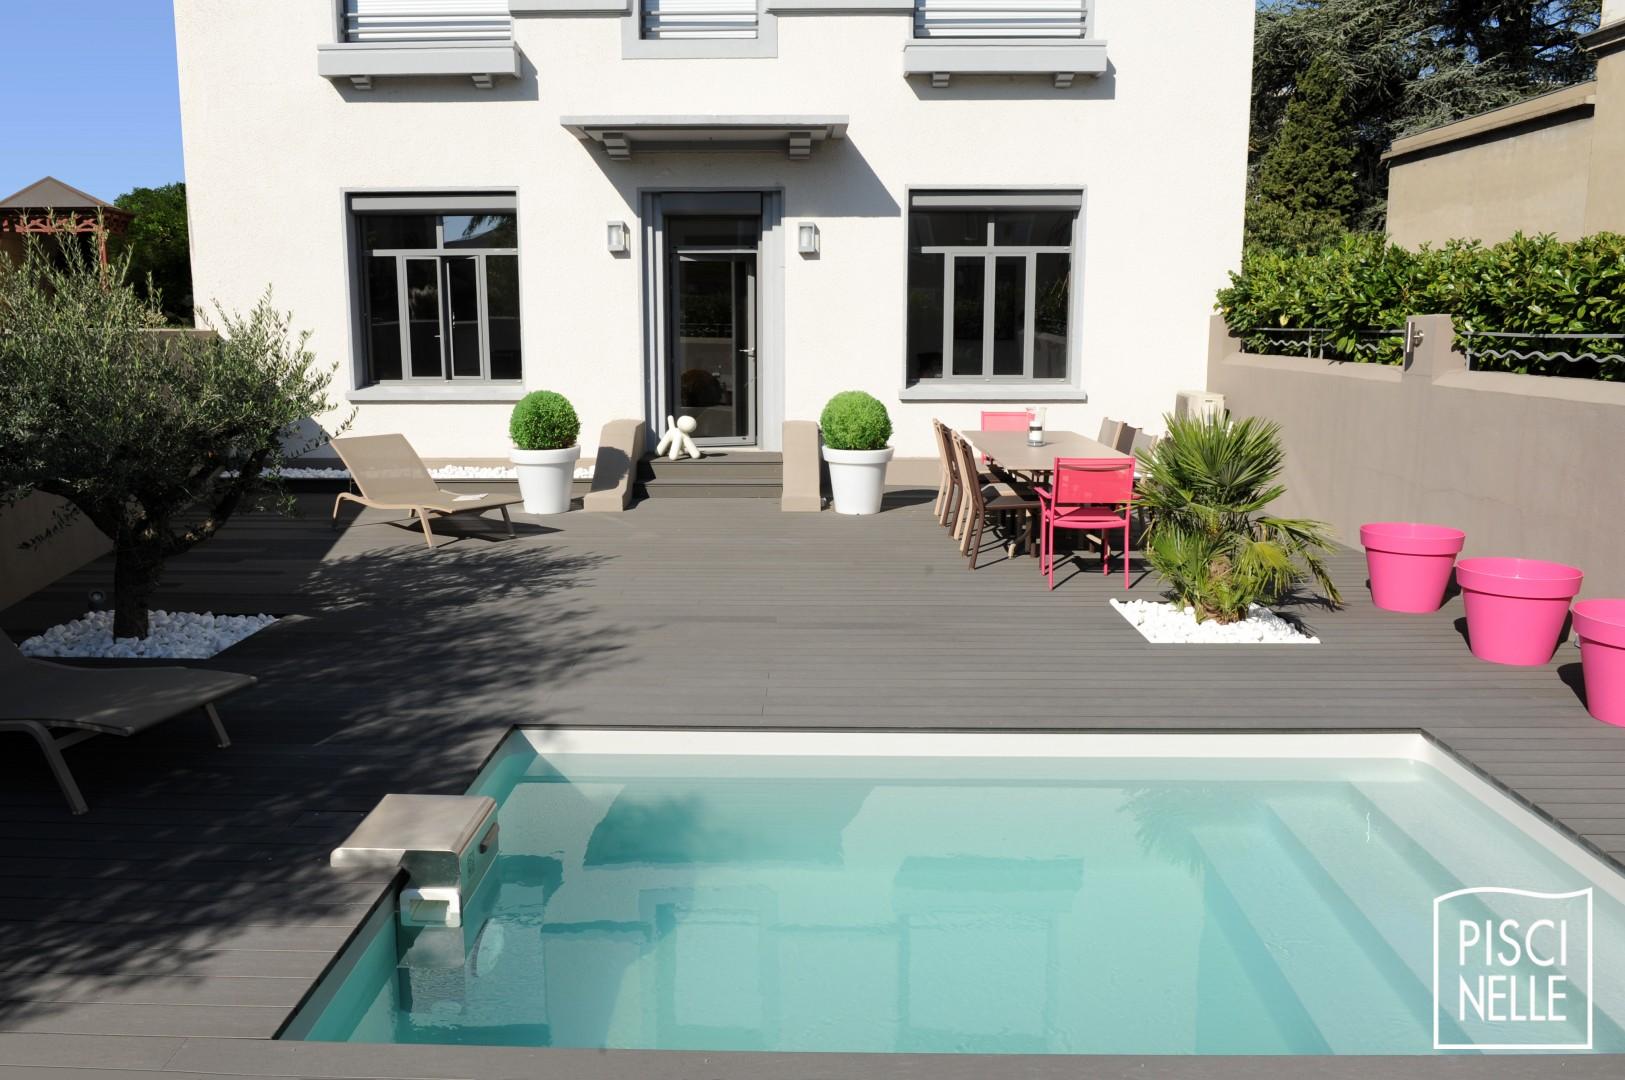 Mini Piscine Petit Jardin piscine de petite taille - piscine xs - mini-piscine